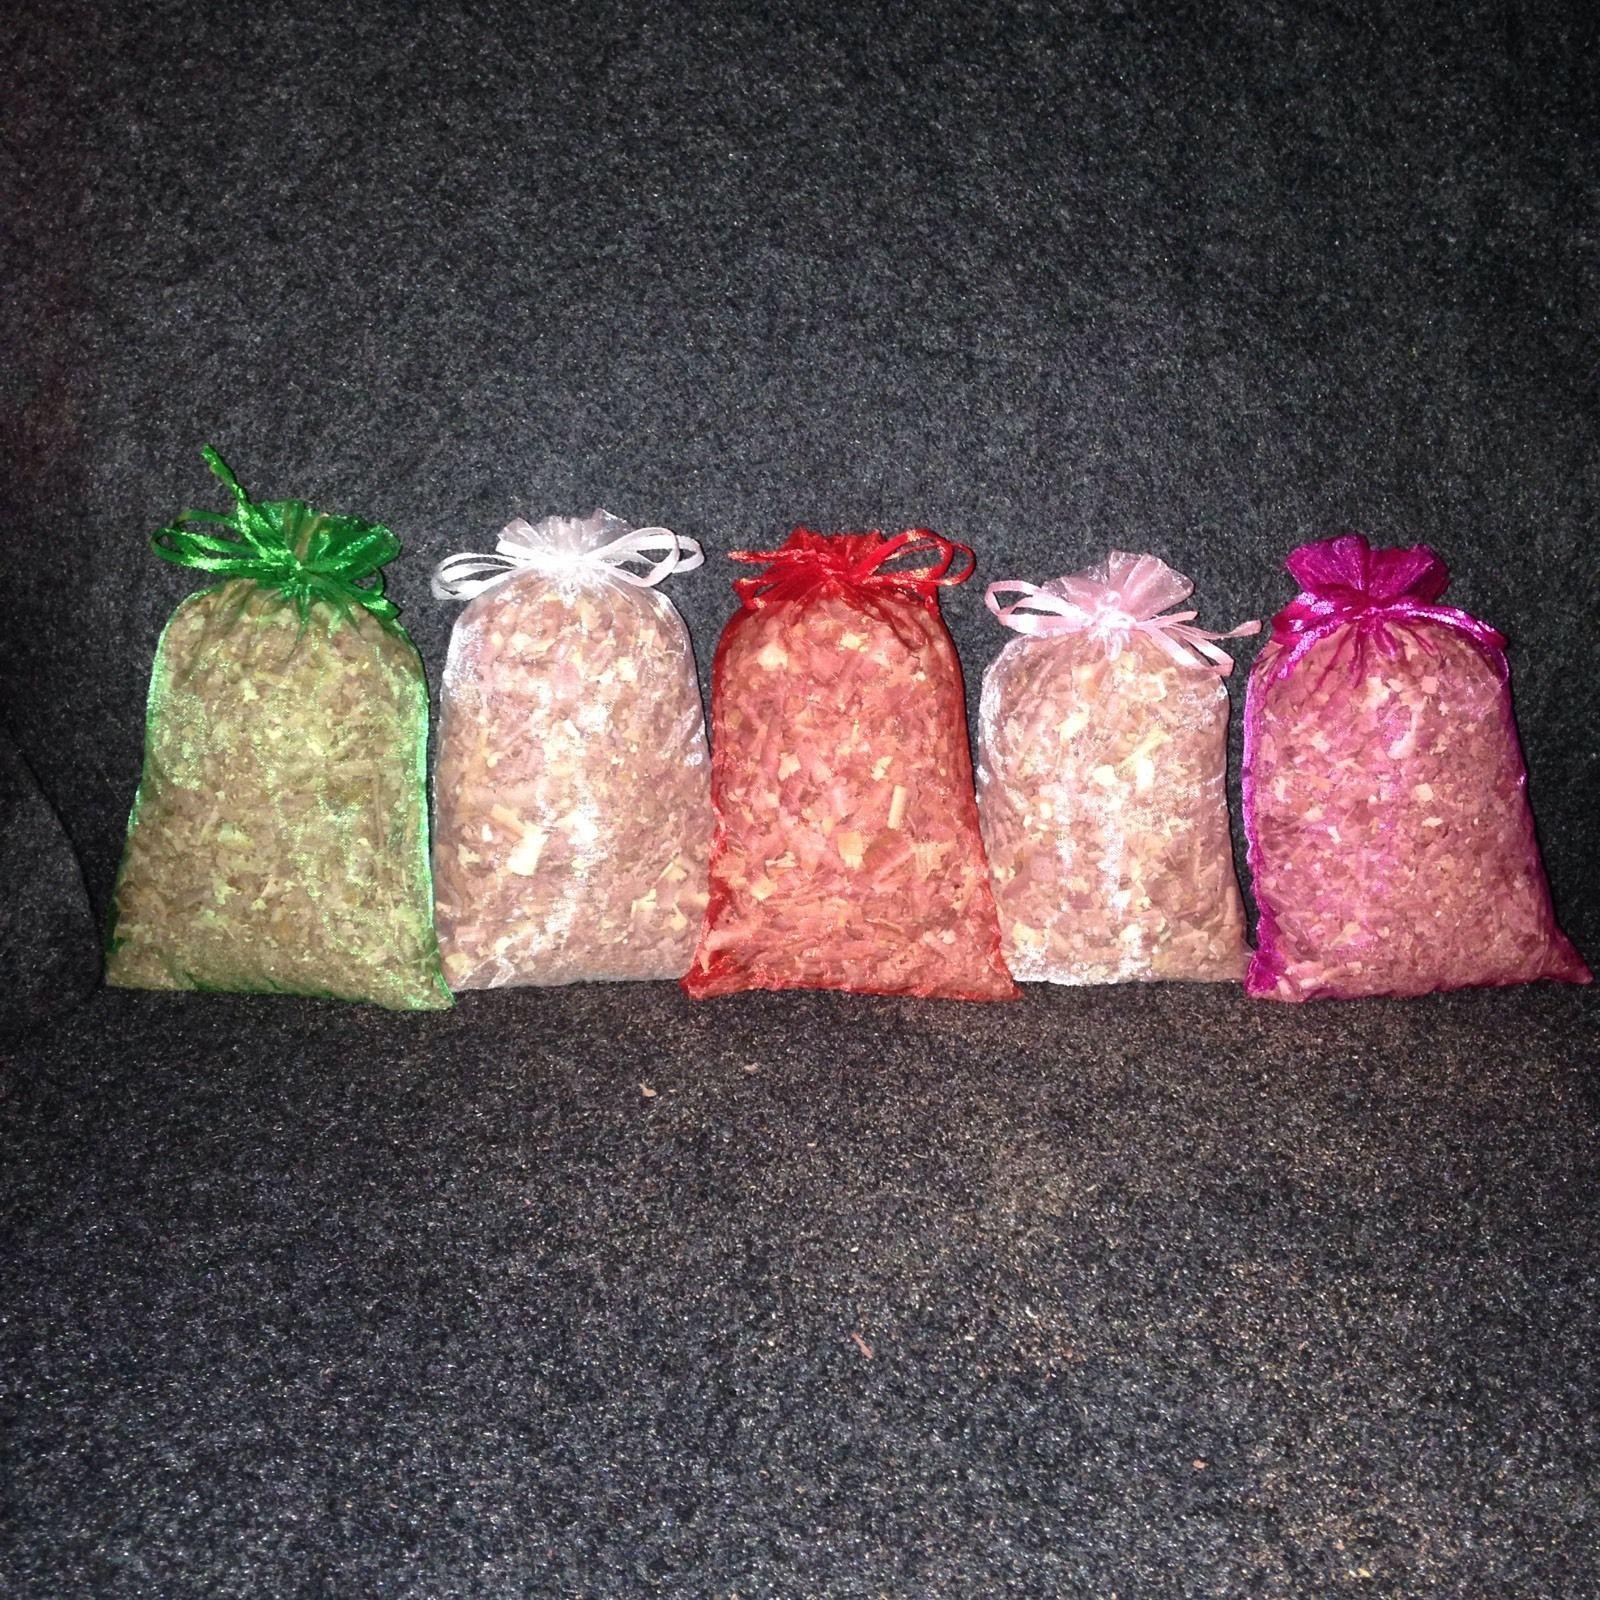 10 Aromatic//Fragrant/Red Cedar/Sachets/Organza Bags/Rustic/Wedding Favor/Party